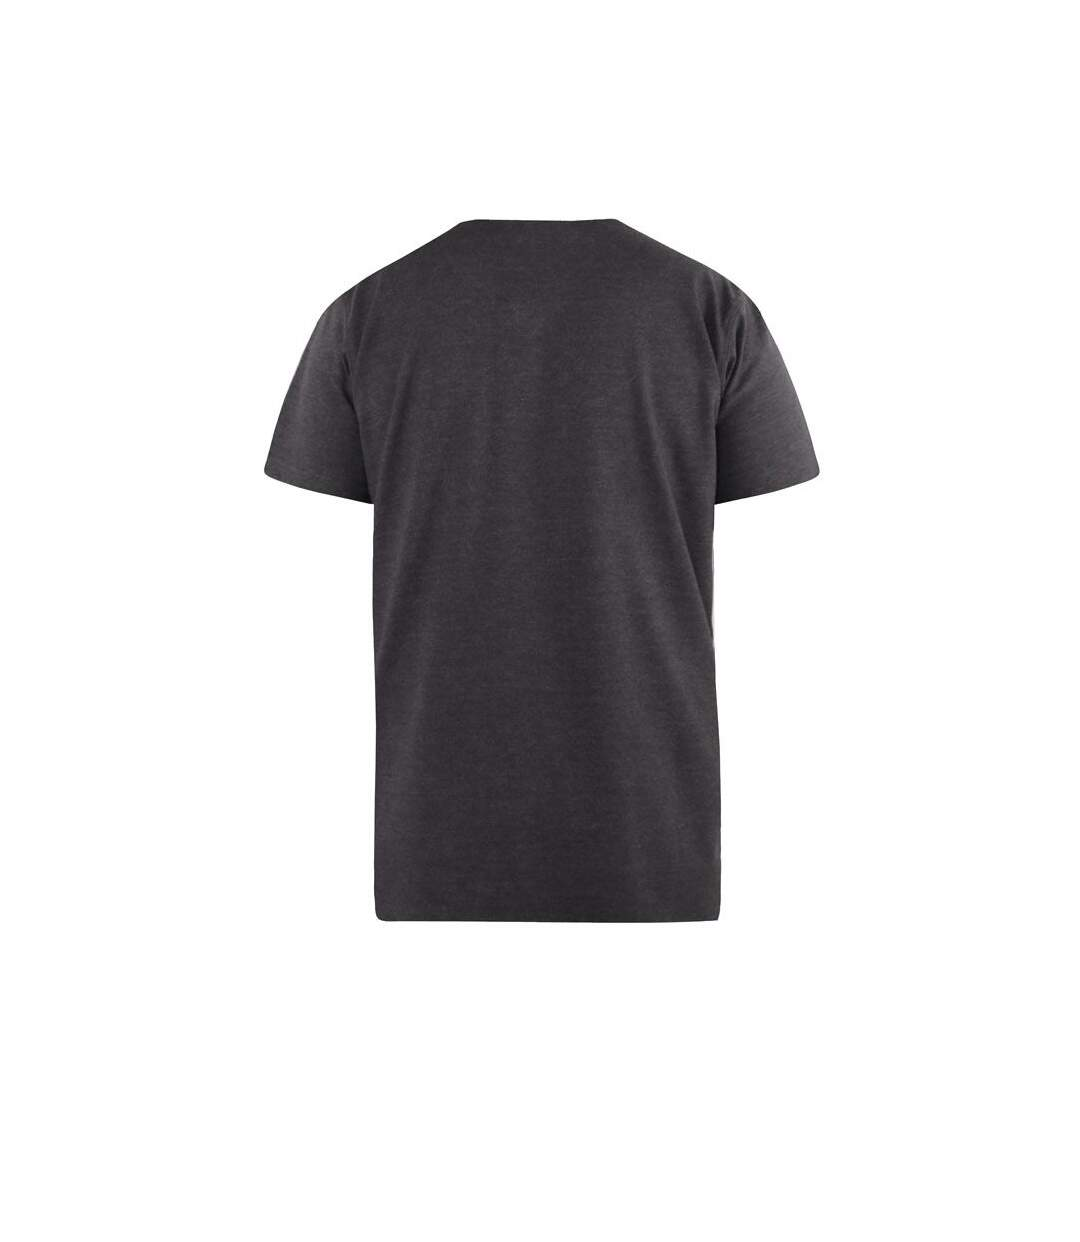 Duke Mens Signature-2 V-Neck T-Shirt (Charcoal Melange) - UTDC167